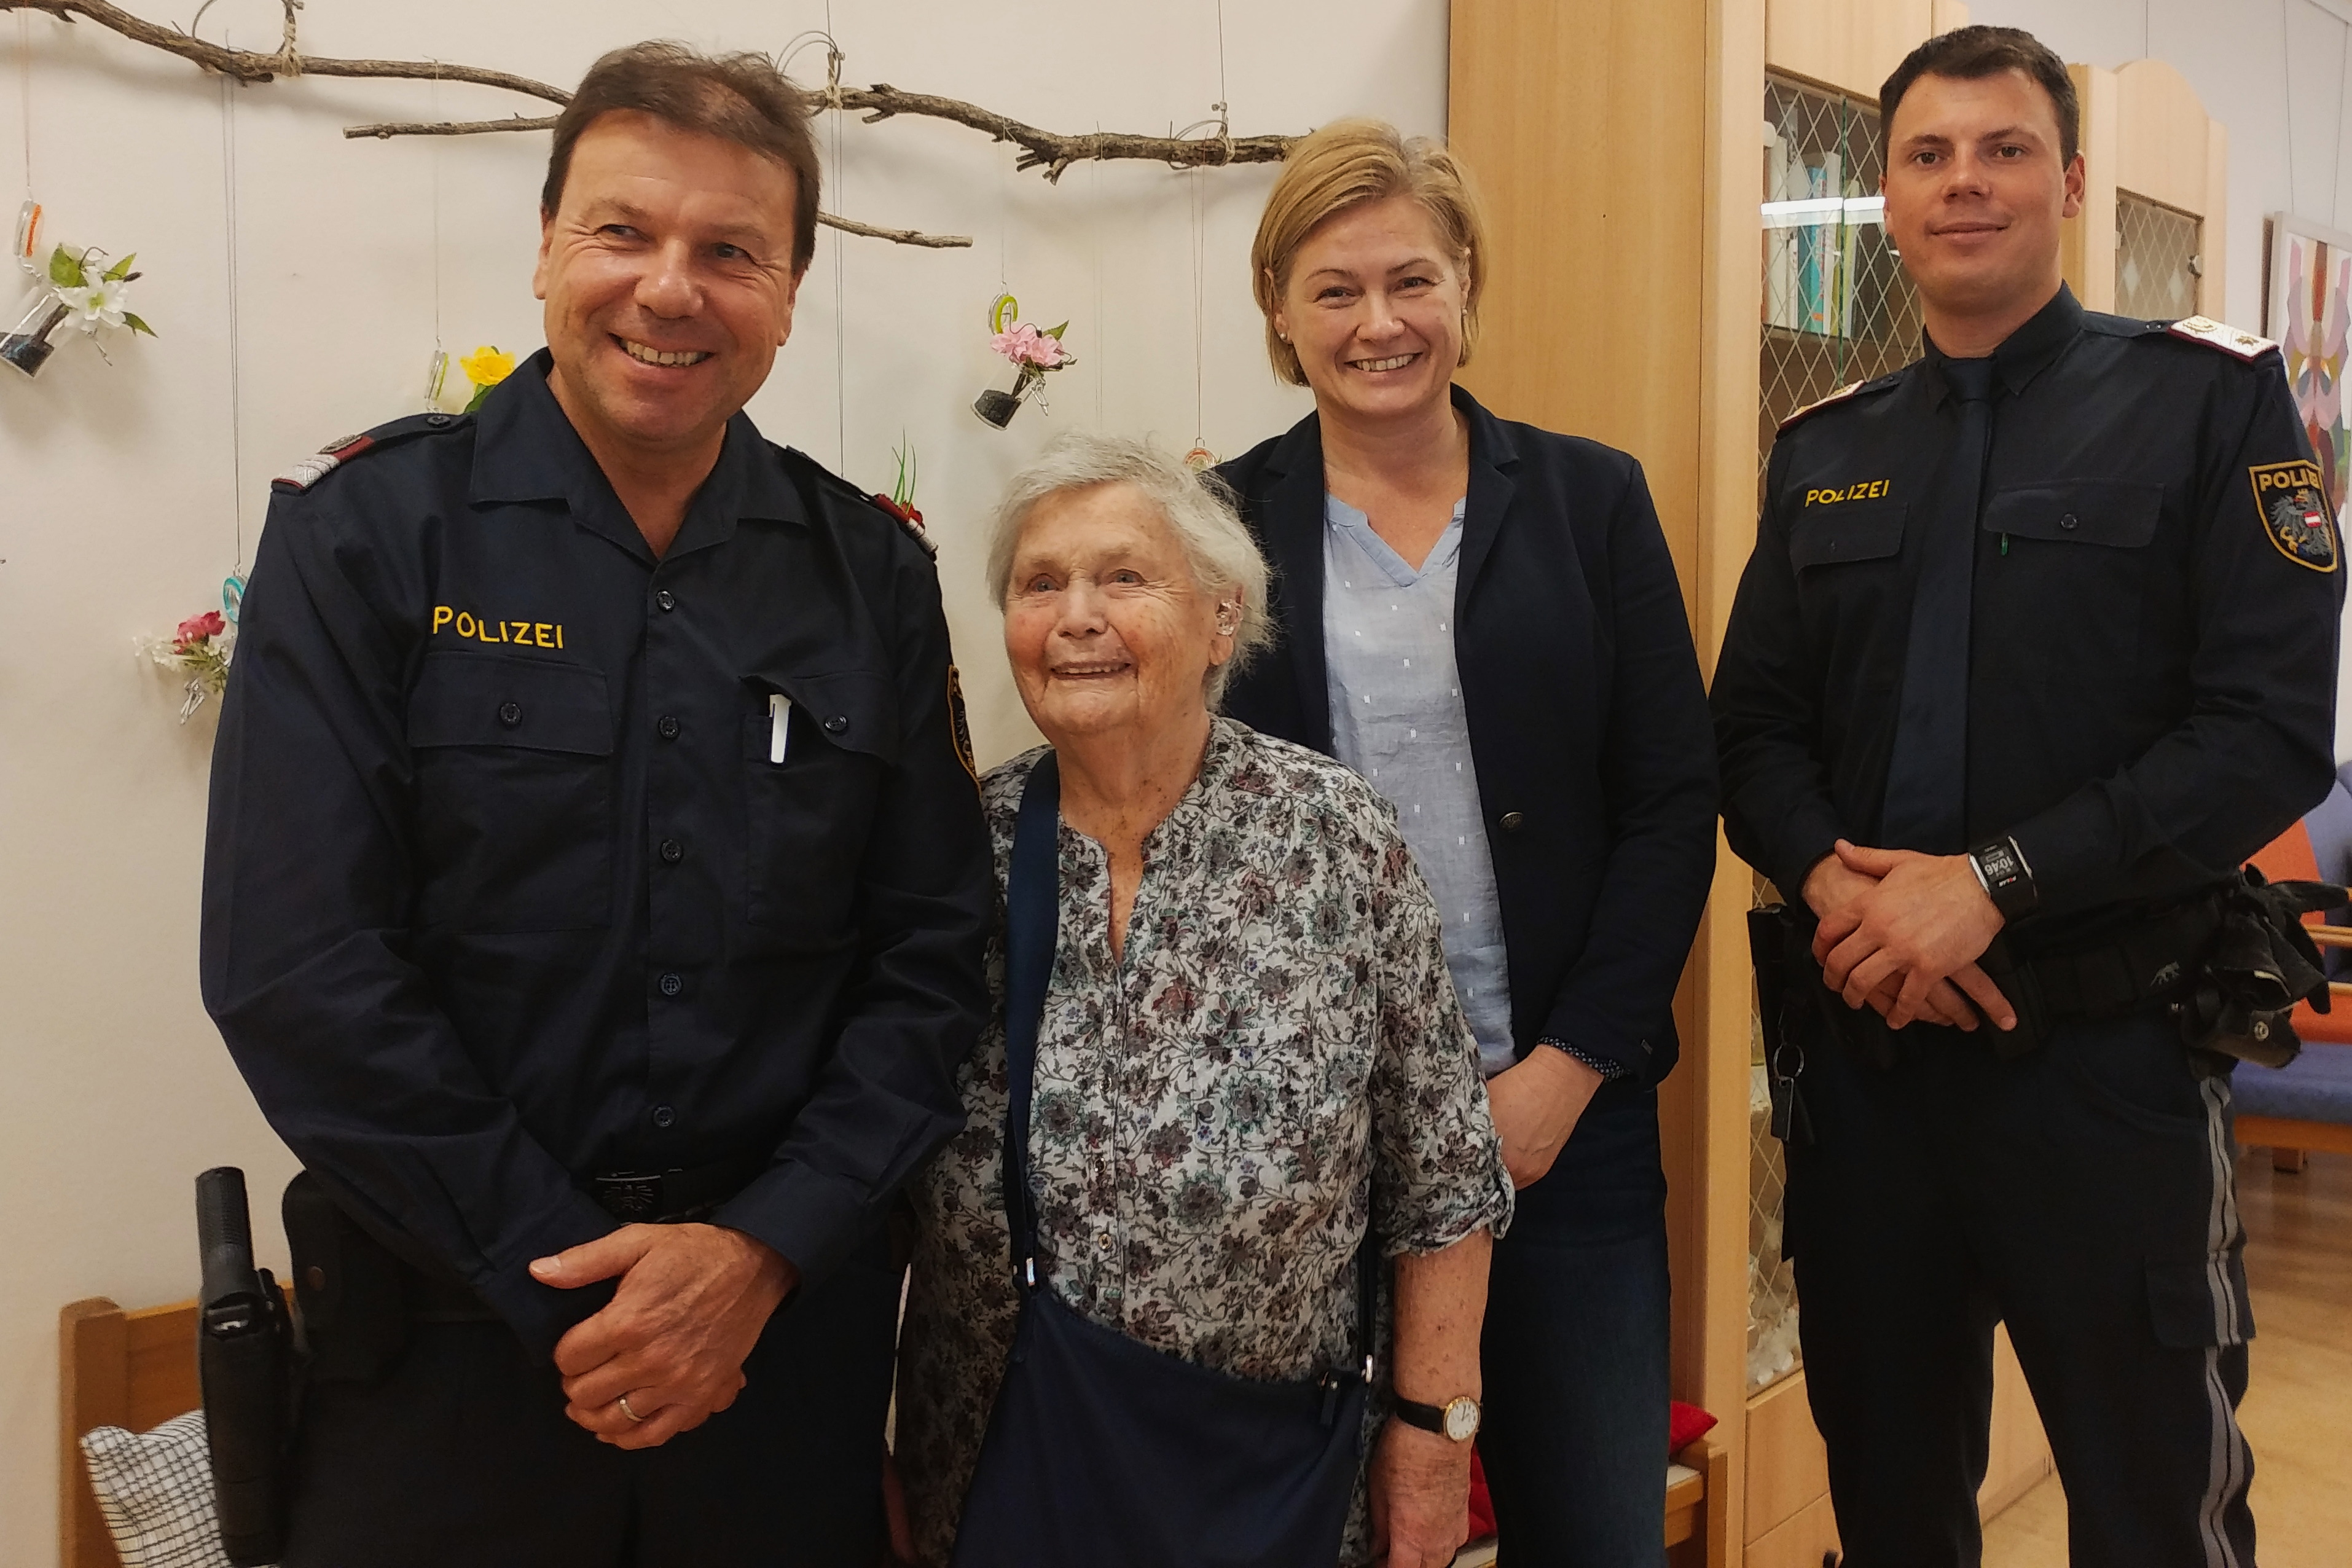 inspecteur Moser, Wilhelmina, directrice, inspecteur Gobold